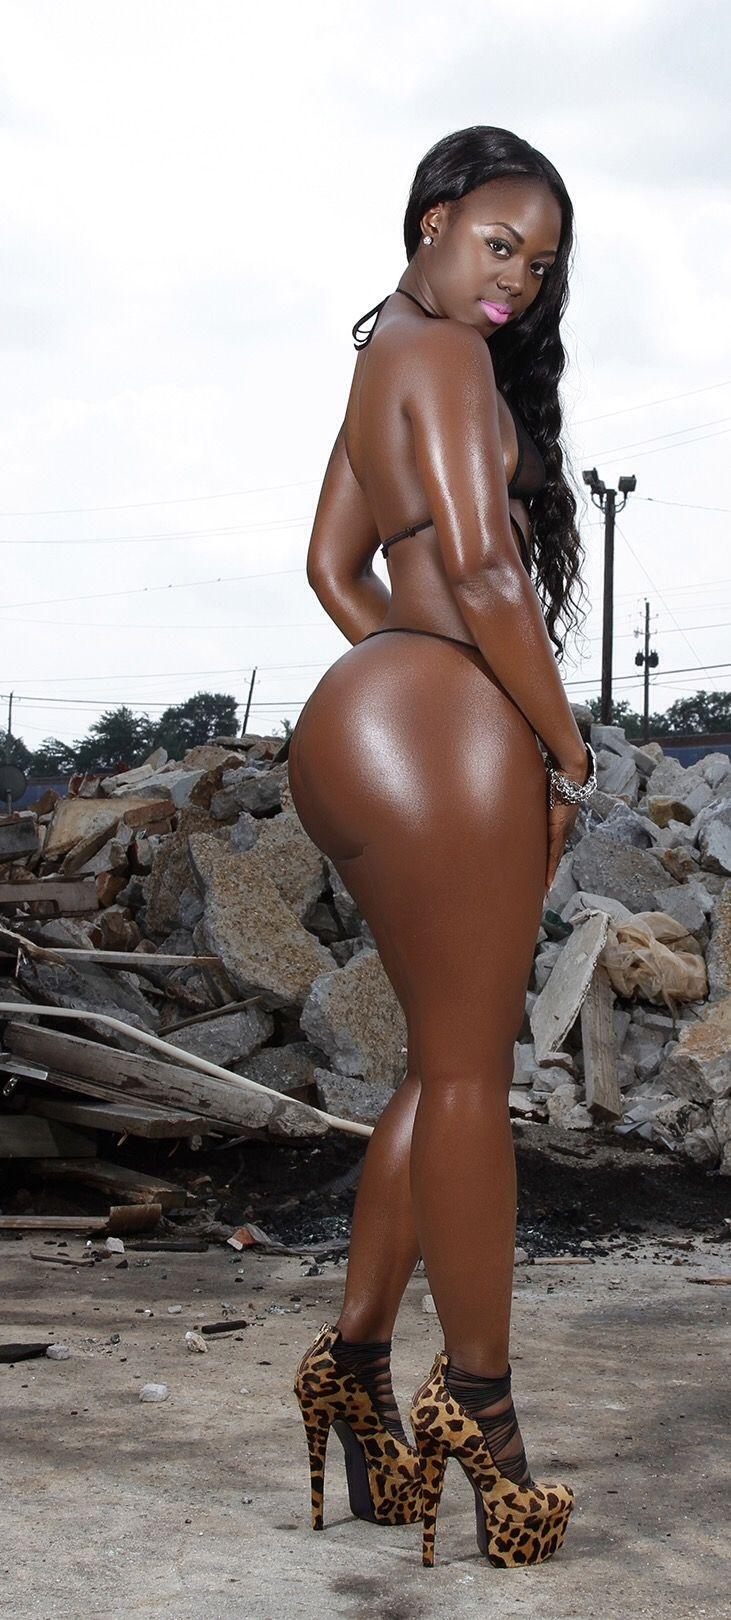 Nude ebony women pictures